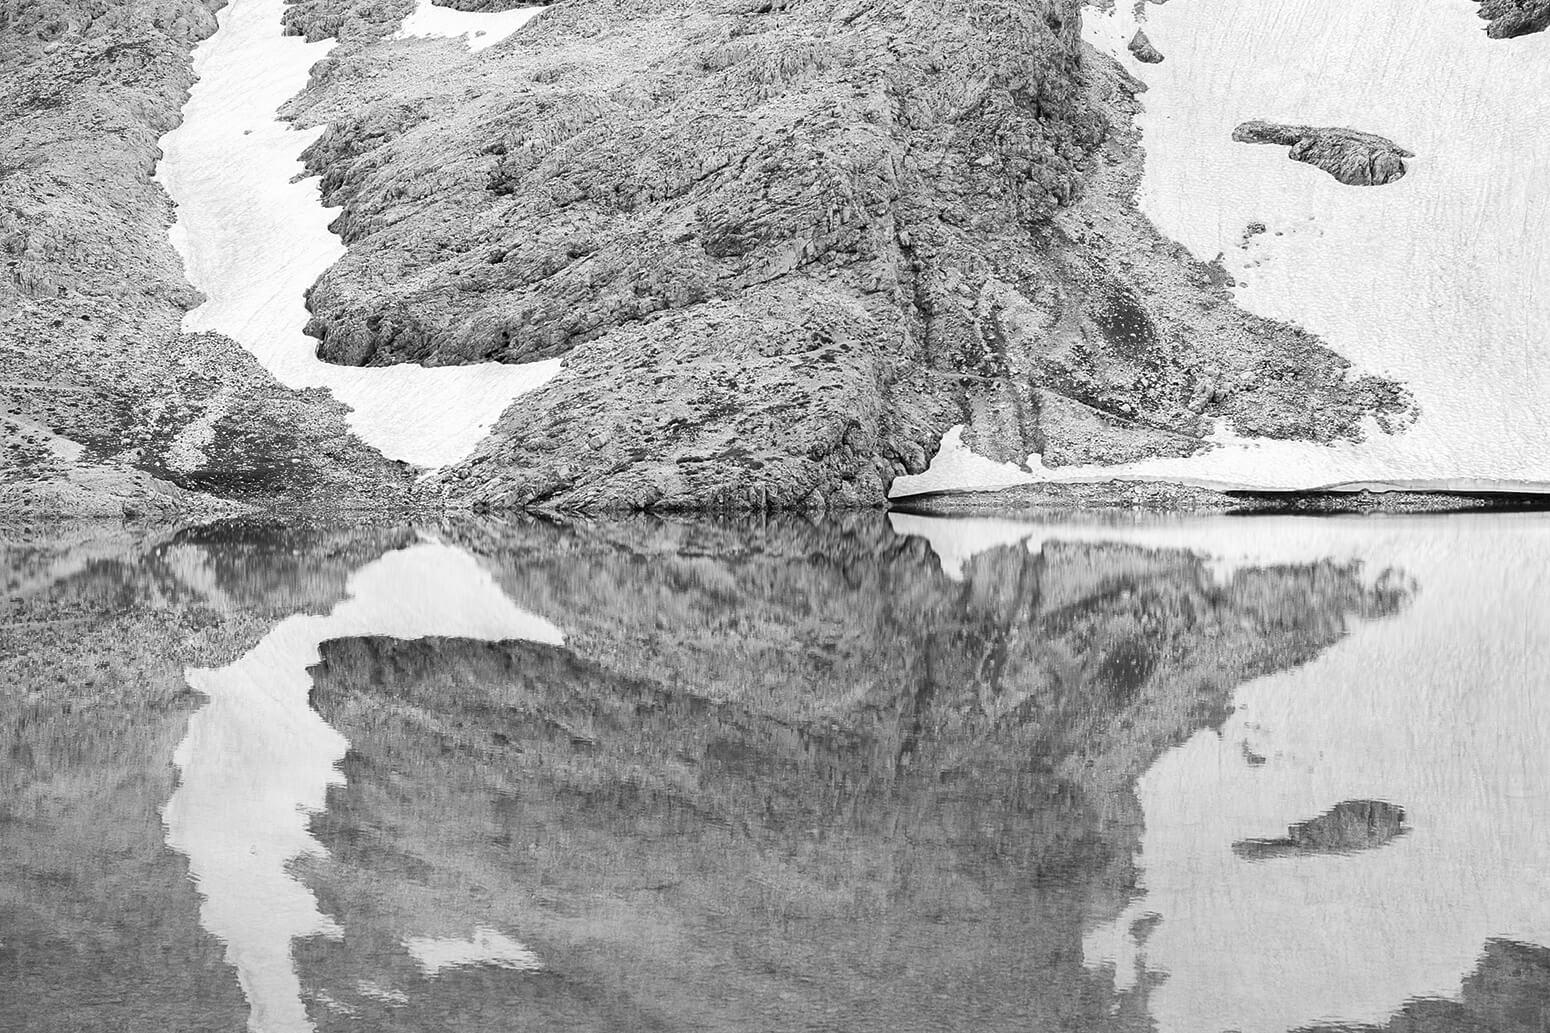 5 Fotodiagnostik Davide Baldrati